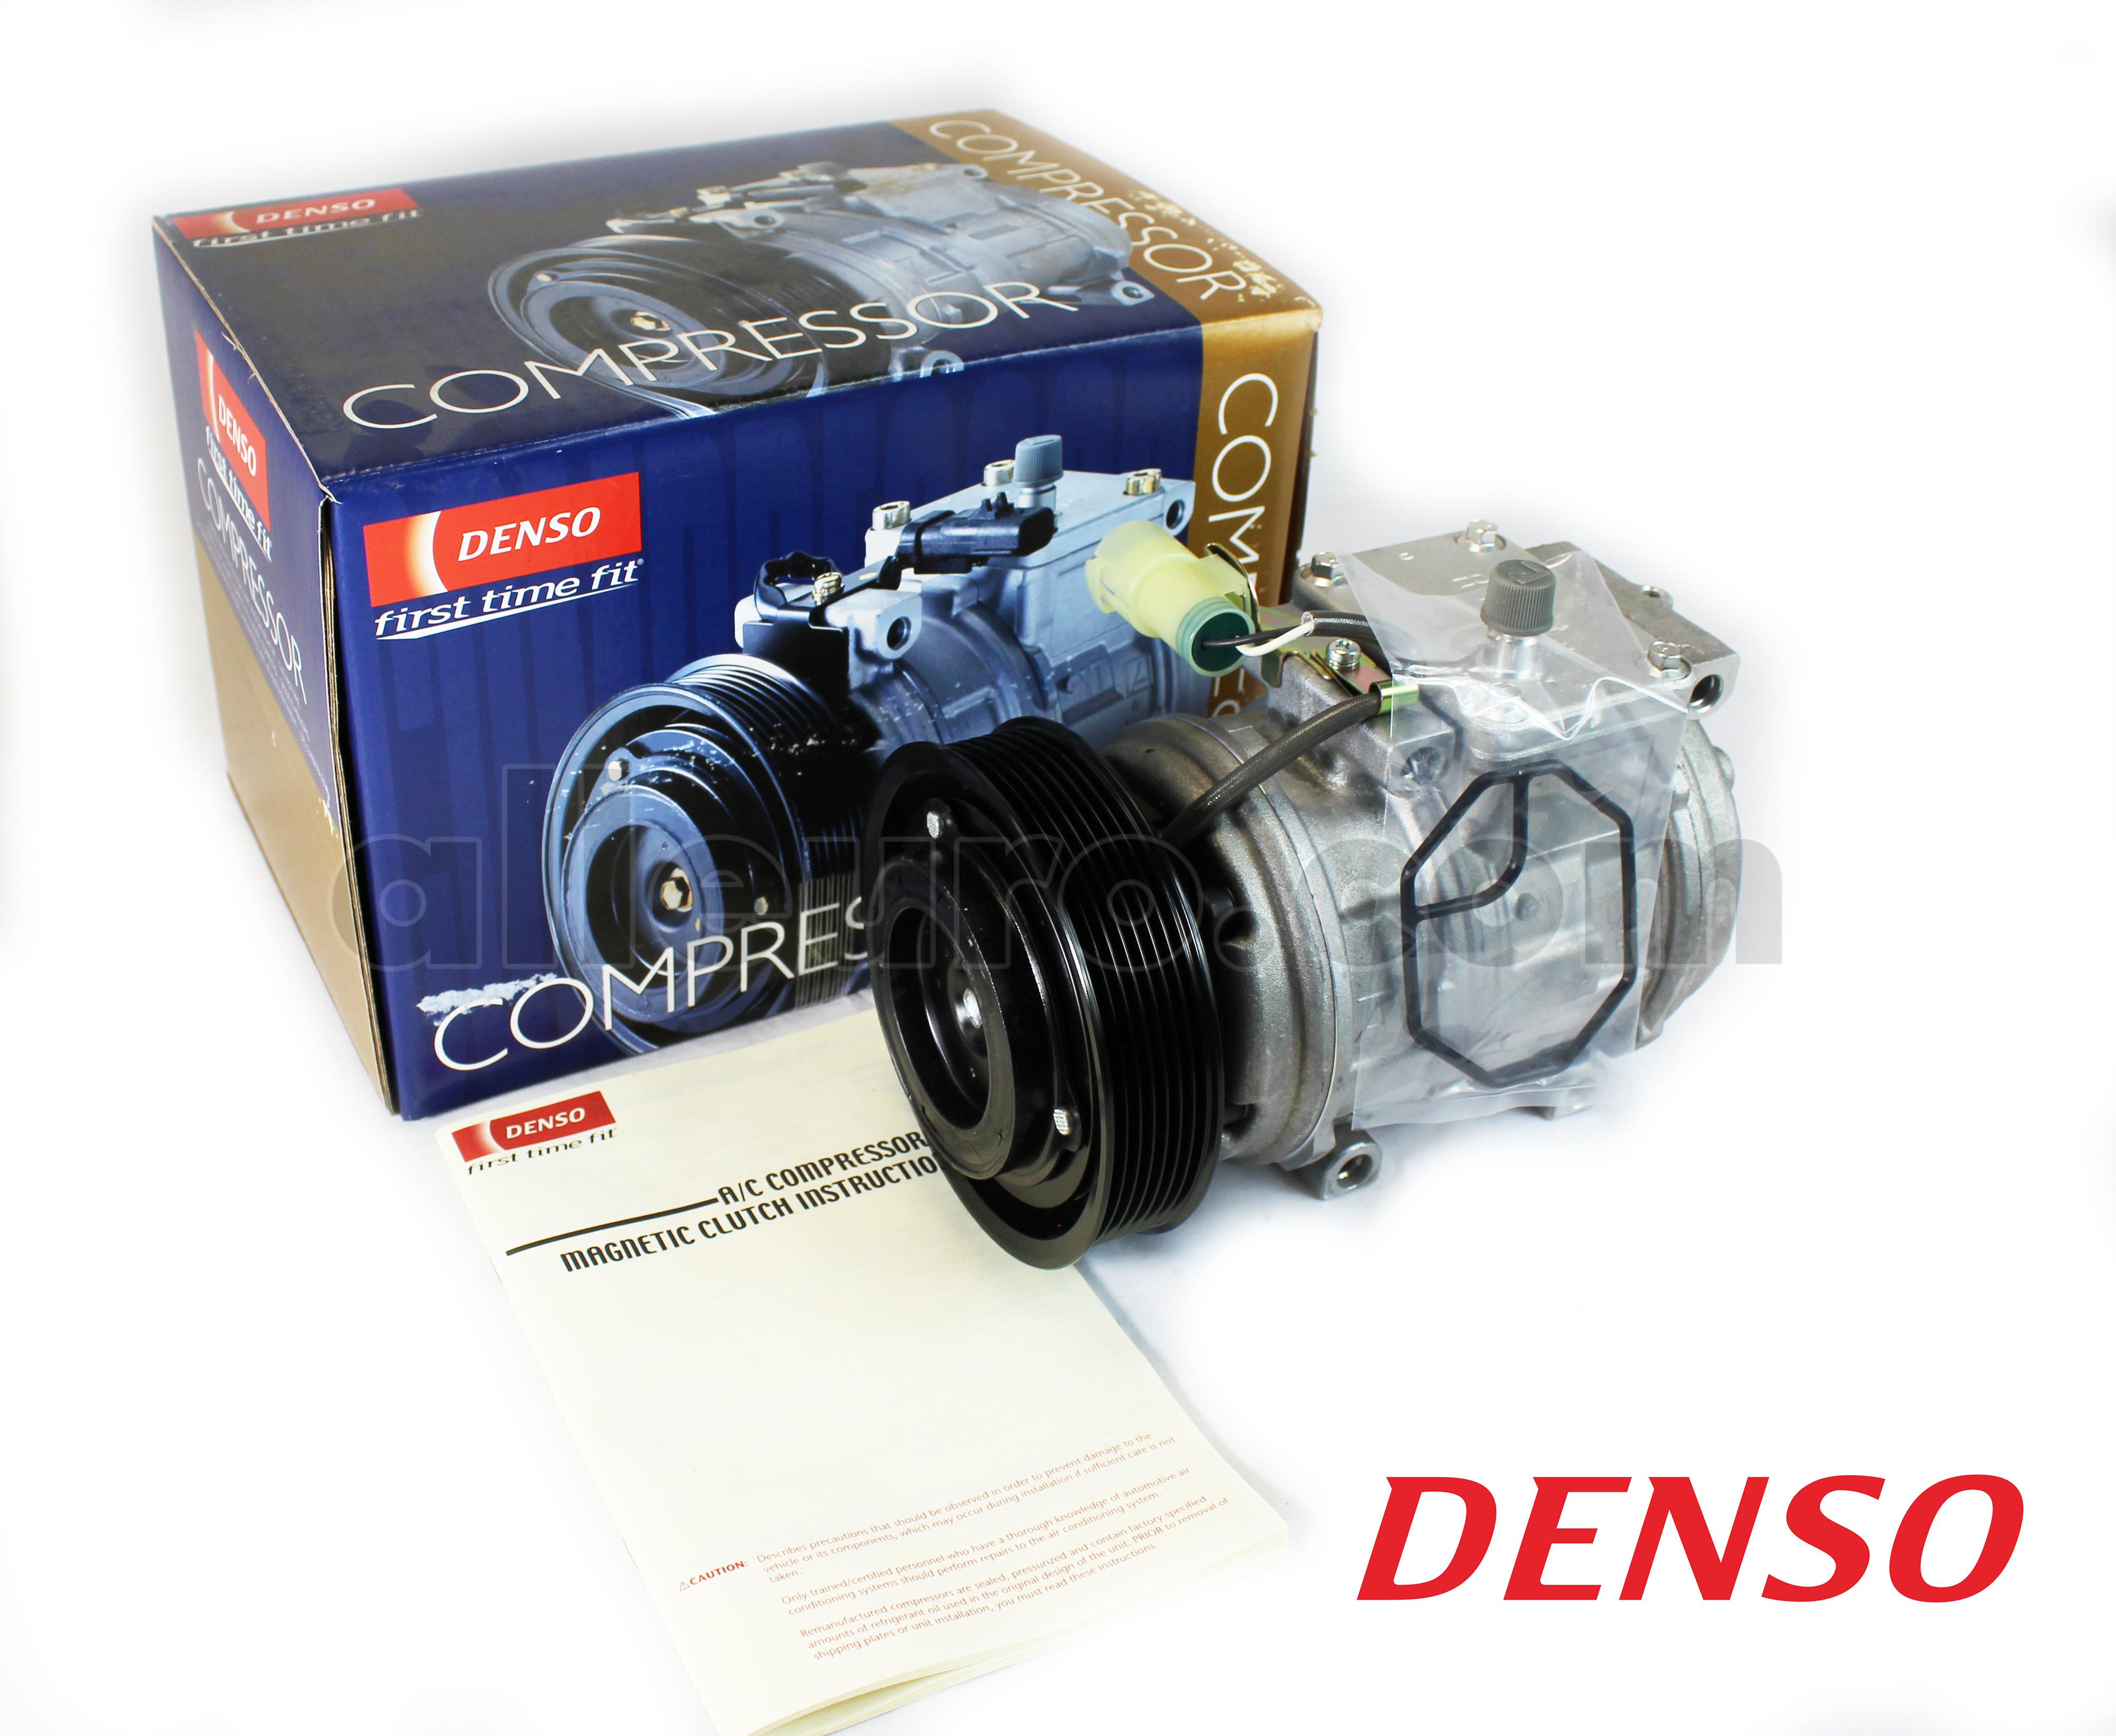 Denso 471-5020 A//C Compressor with Clutch